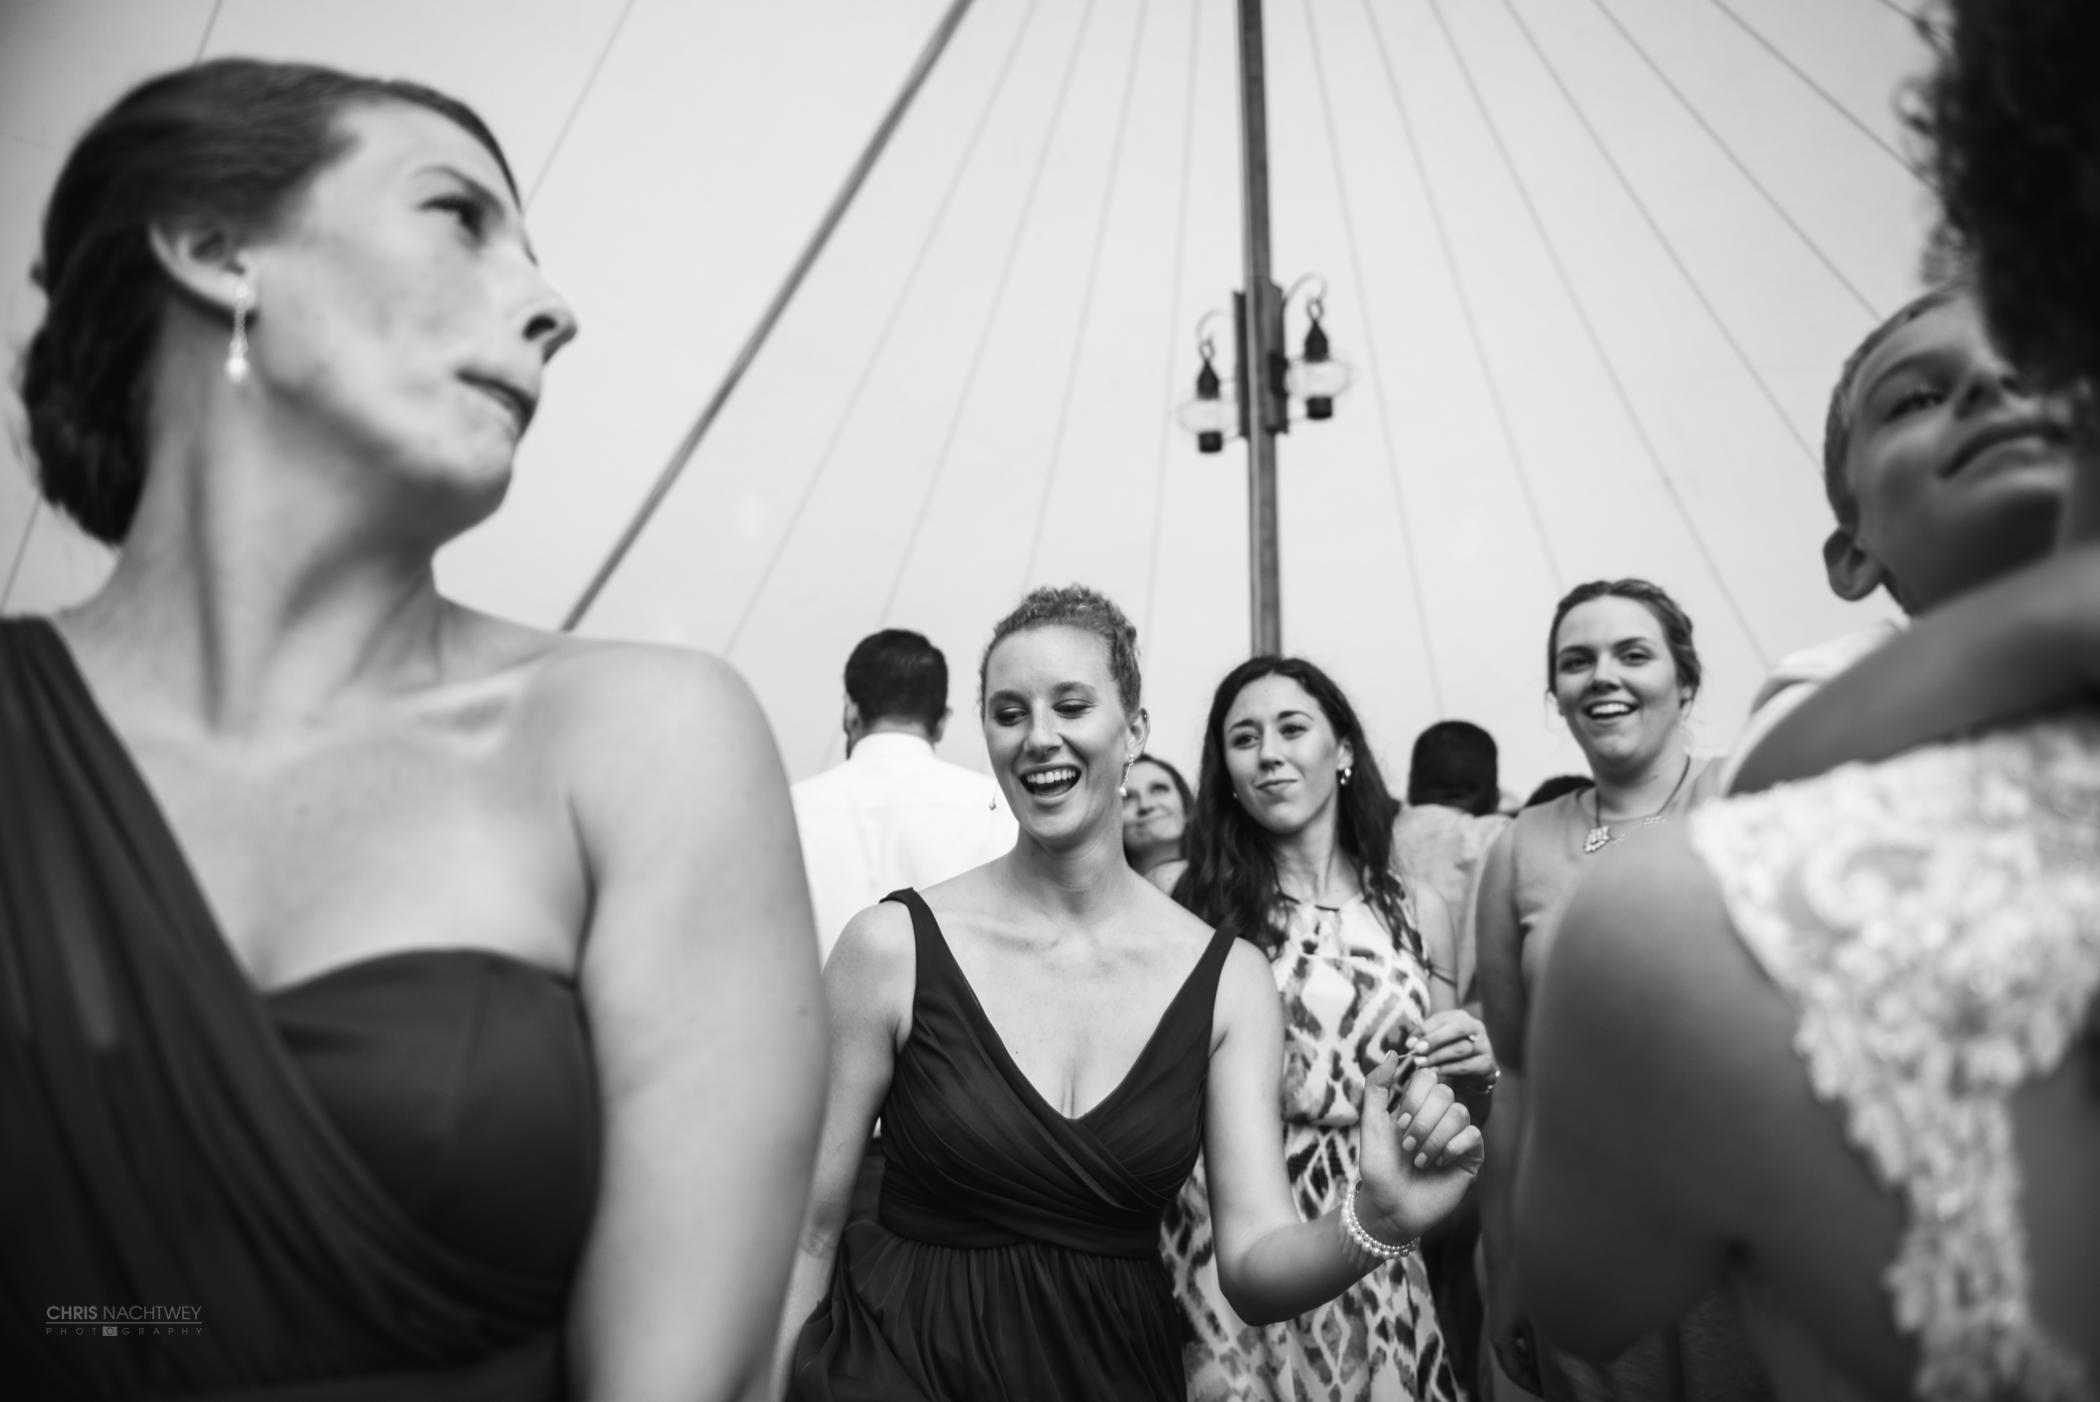 candid-ct-wedding-photos-chris-nachtwey.jpg